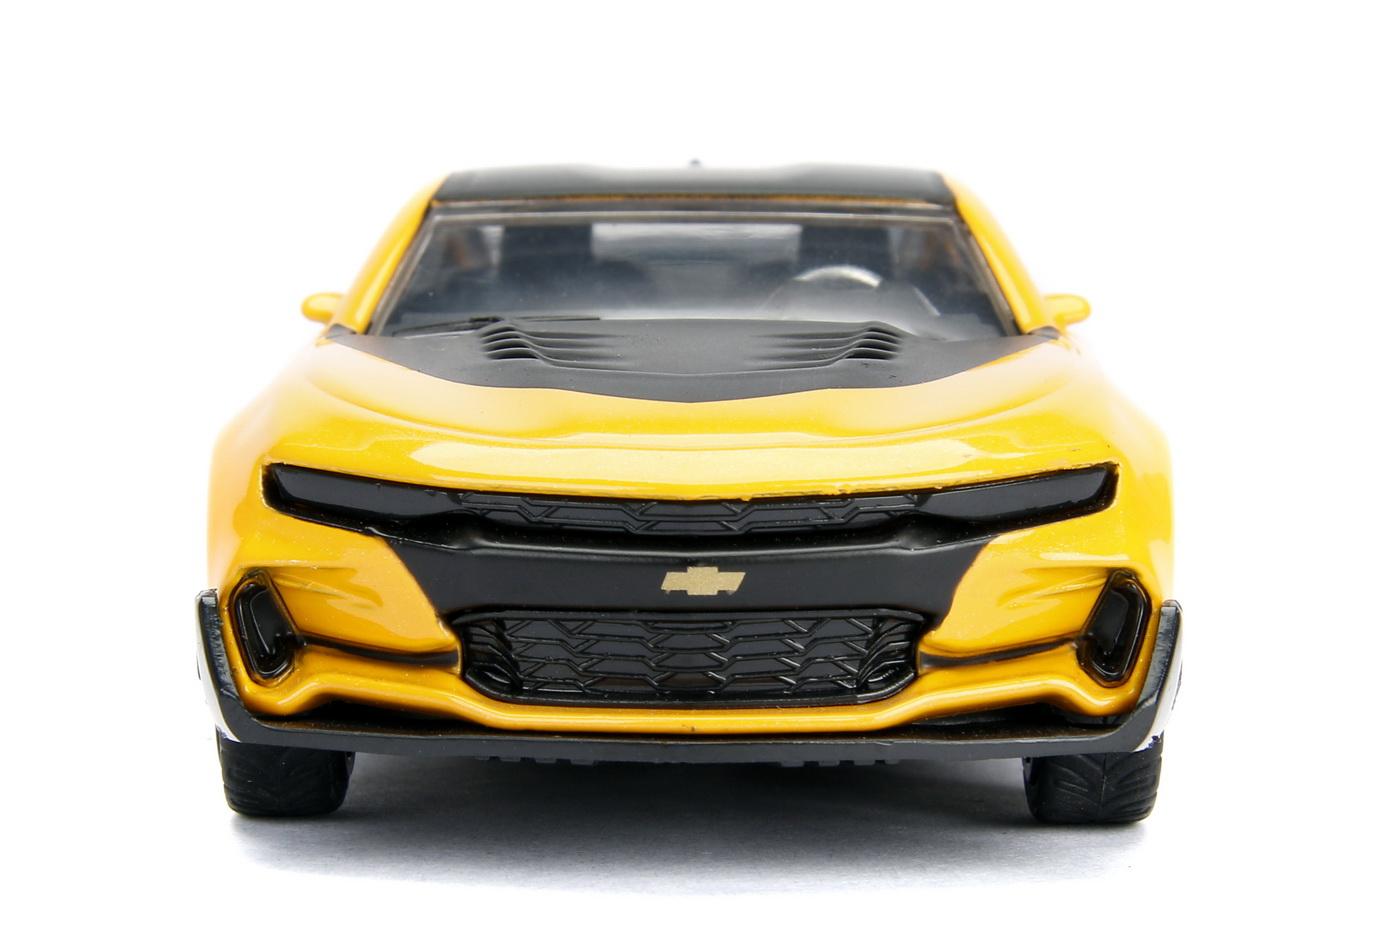 Masinuta Metalica Transformers 2016 Chevy Camaro Scara 1 La 32   JadaToys - 7